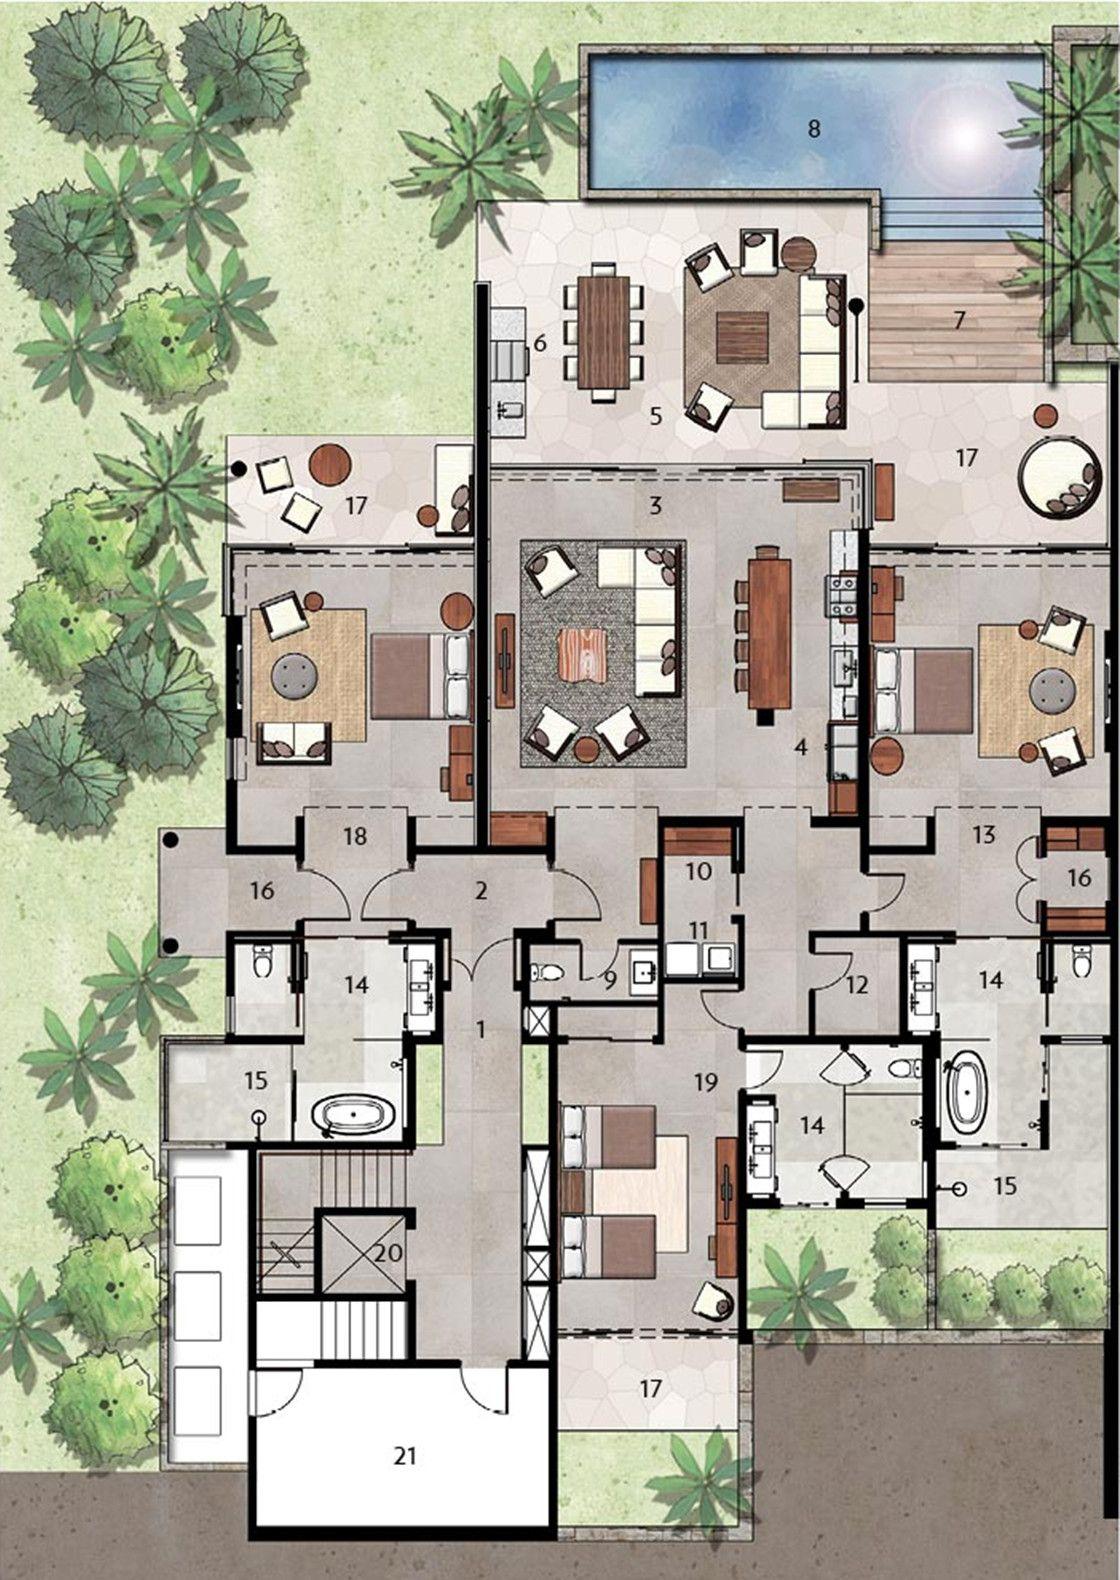 Luxury Villas Floor Plans Villa plan, Floor plans, Home